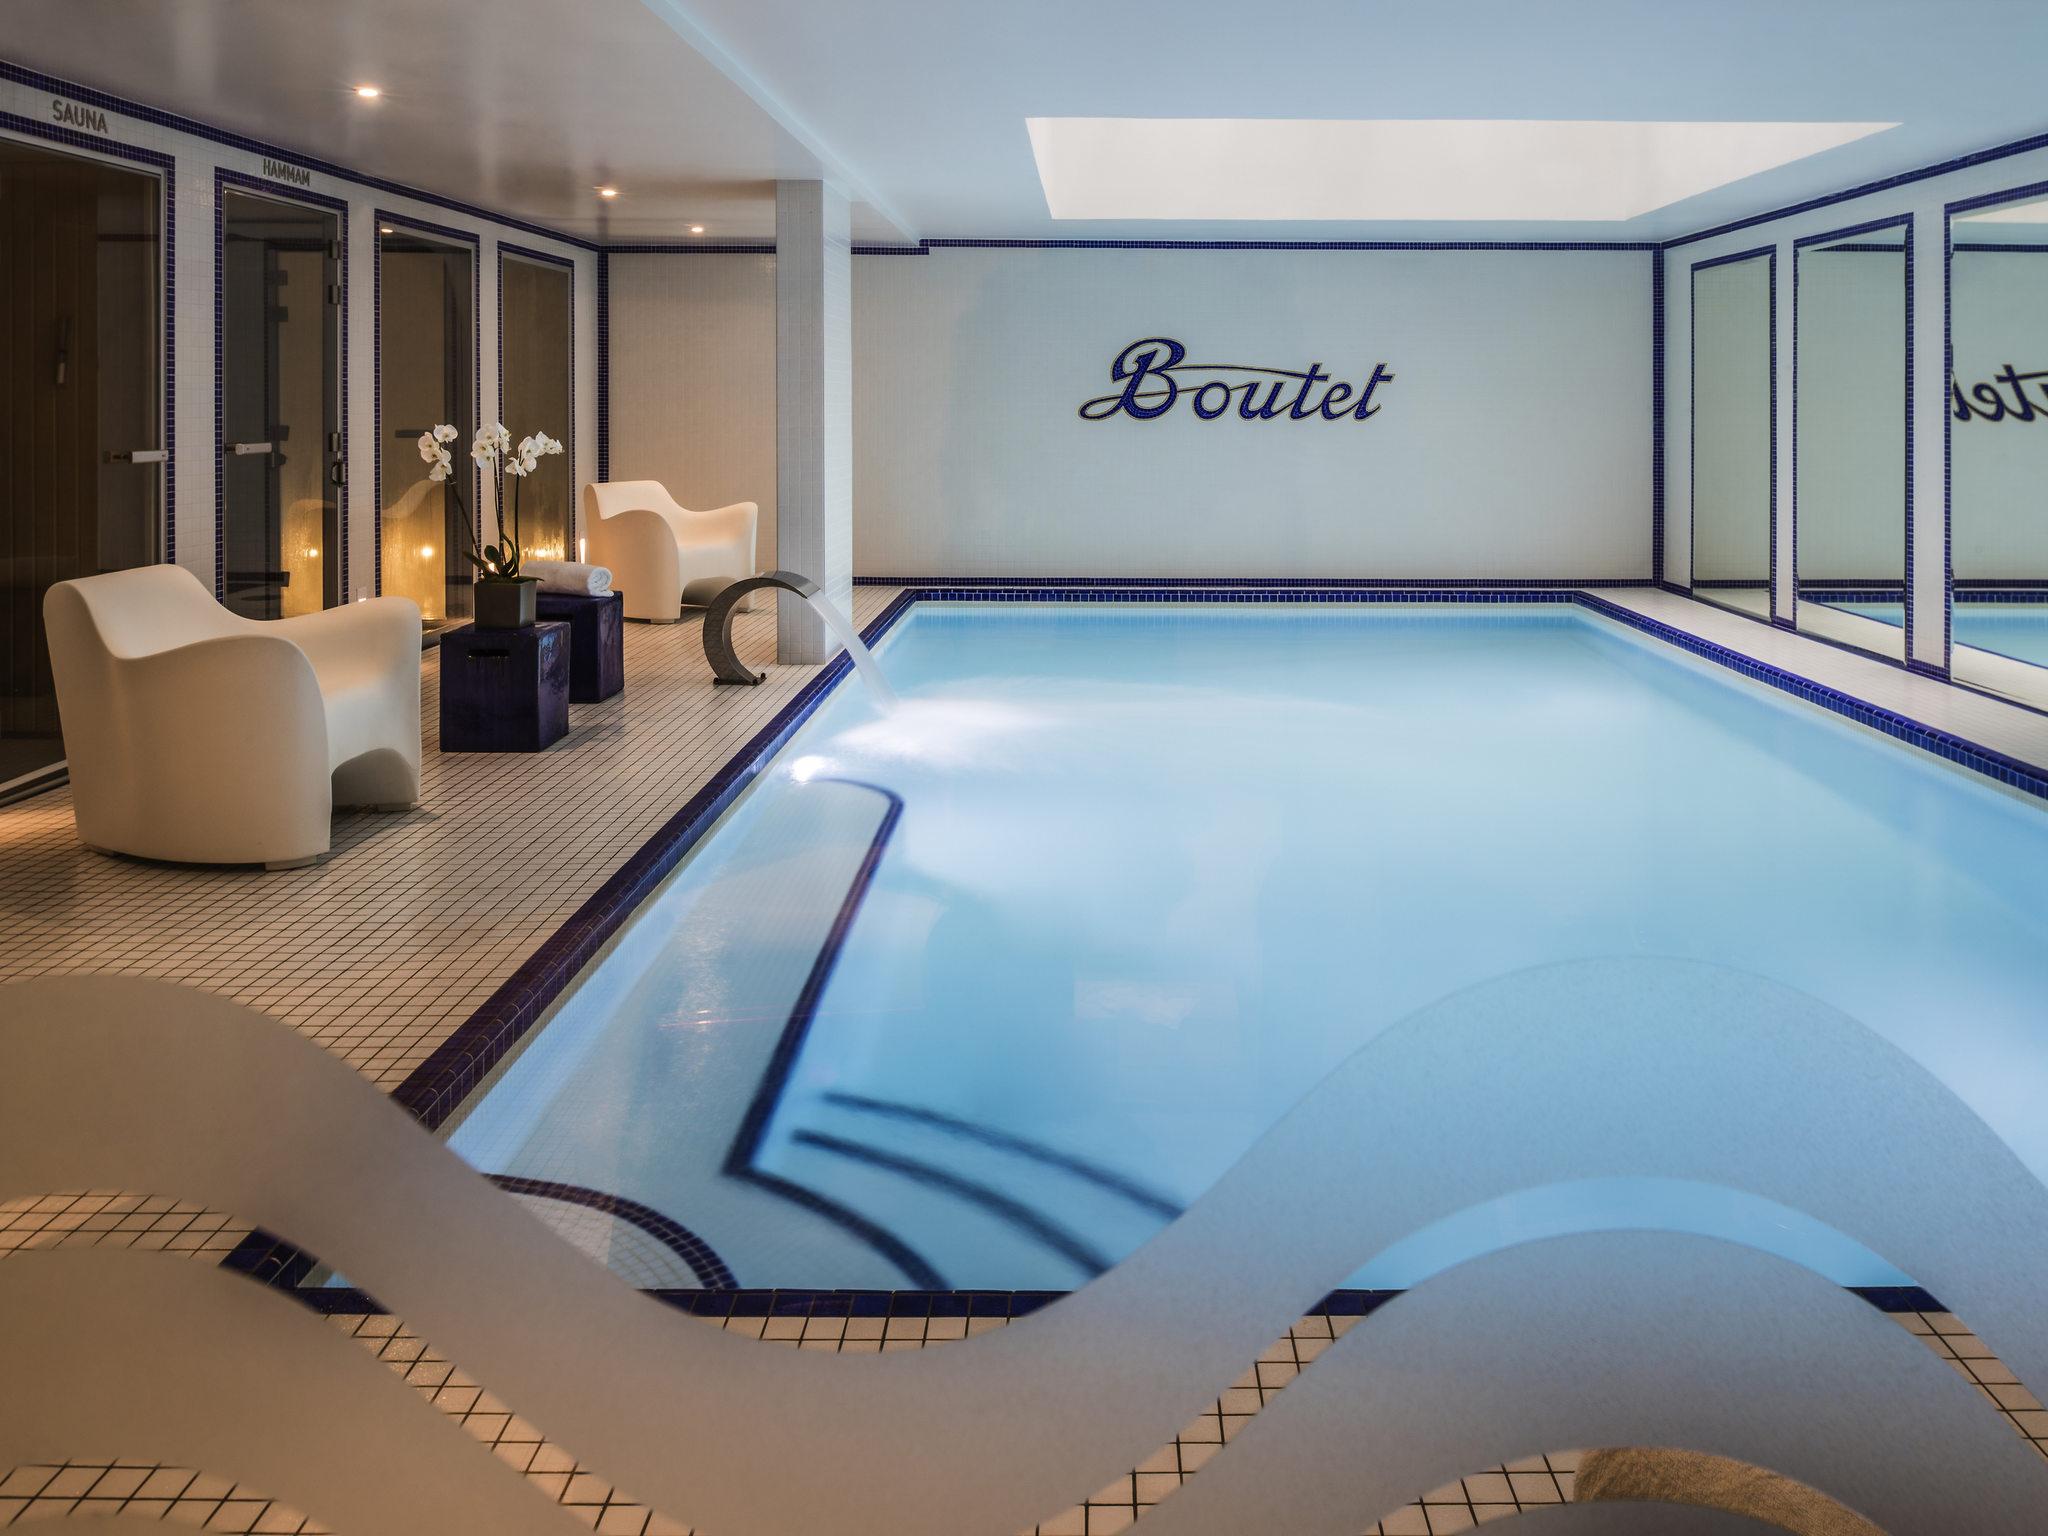 Hôtel - Hôtel Paris Bastille Boutet - MGallery by Sofitel